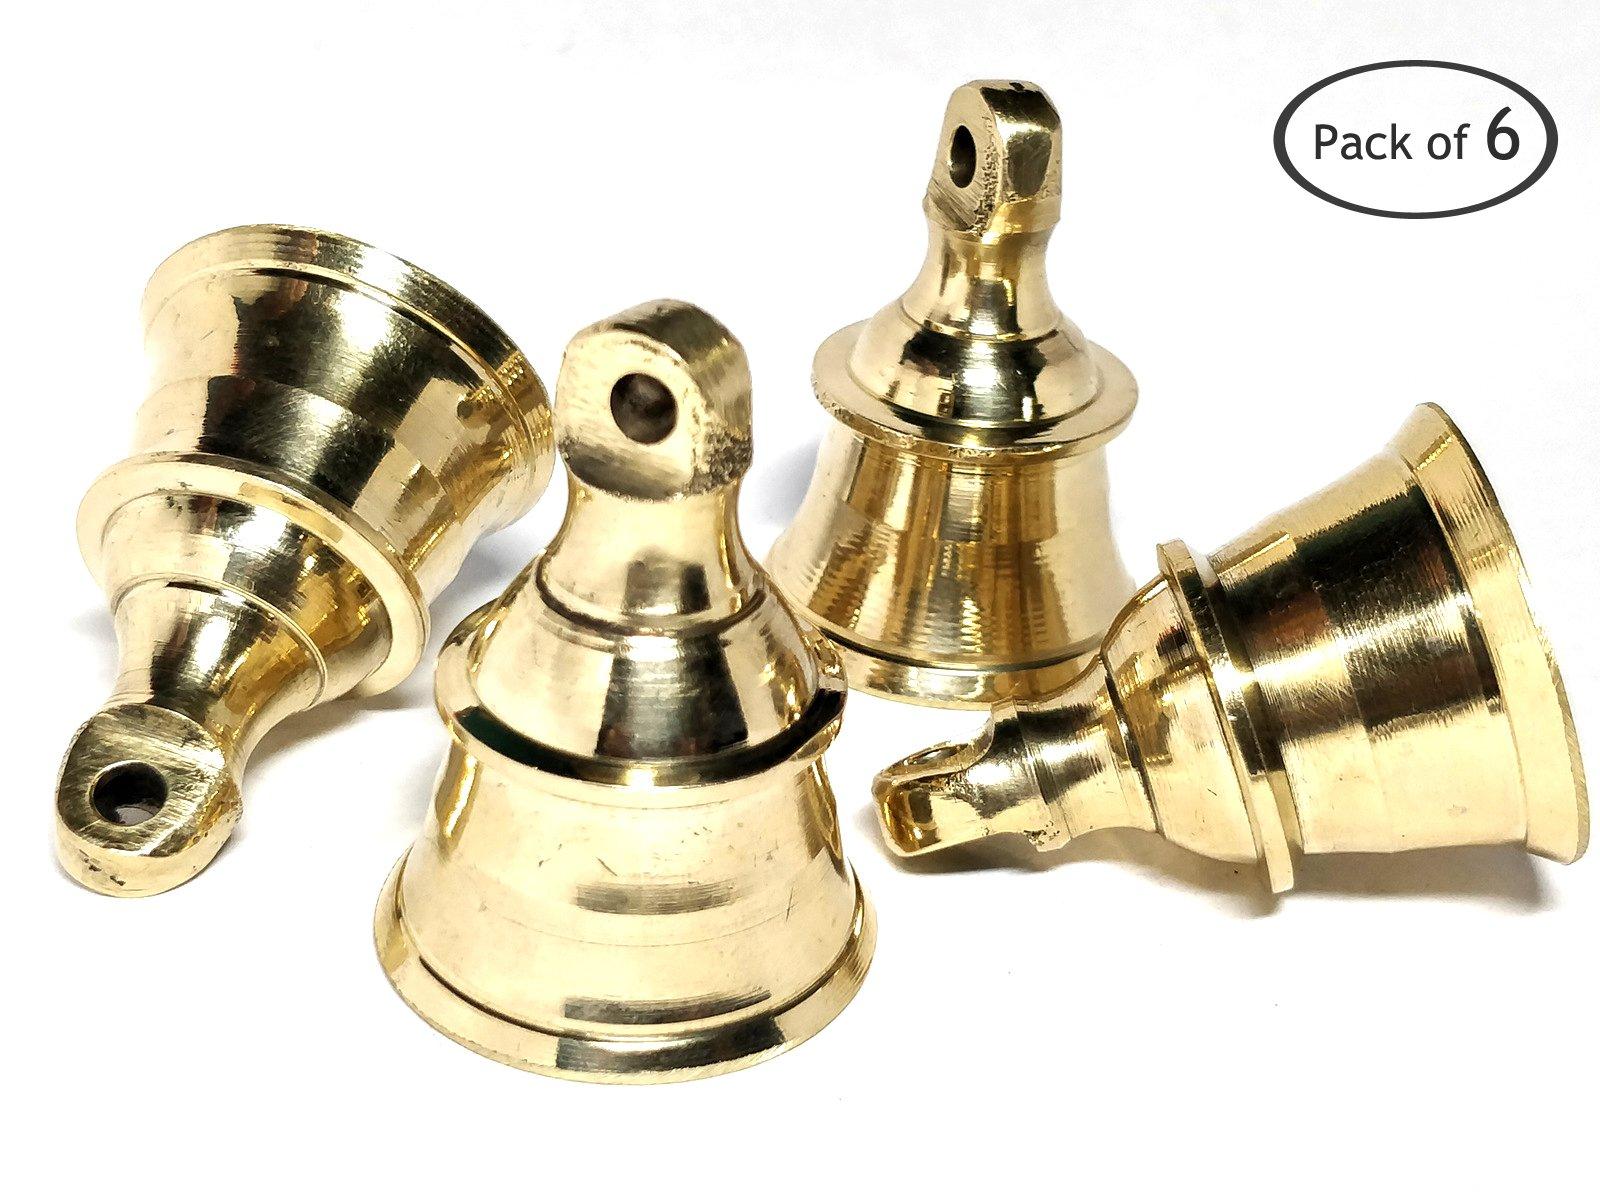 AzKrafts Decorative Indian Brass Bells Heavy Duty Solid Brass 1.6 inch, 2 inch, 2.3 inch and 2.6 inch Bells (1.6 inch, 6 pack)